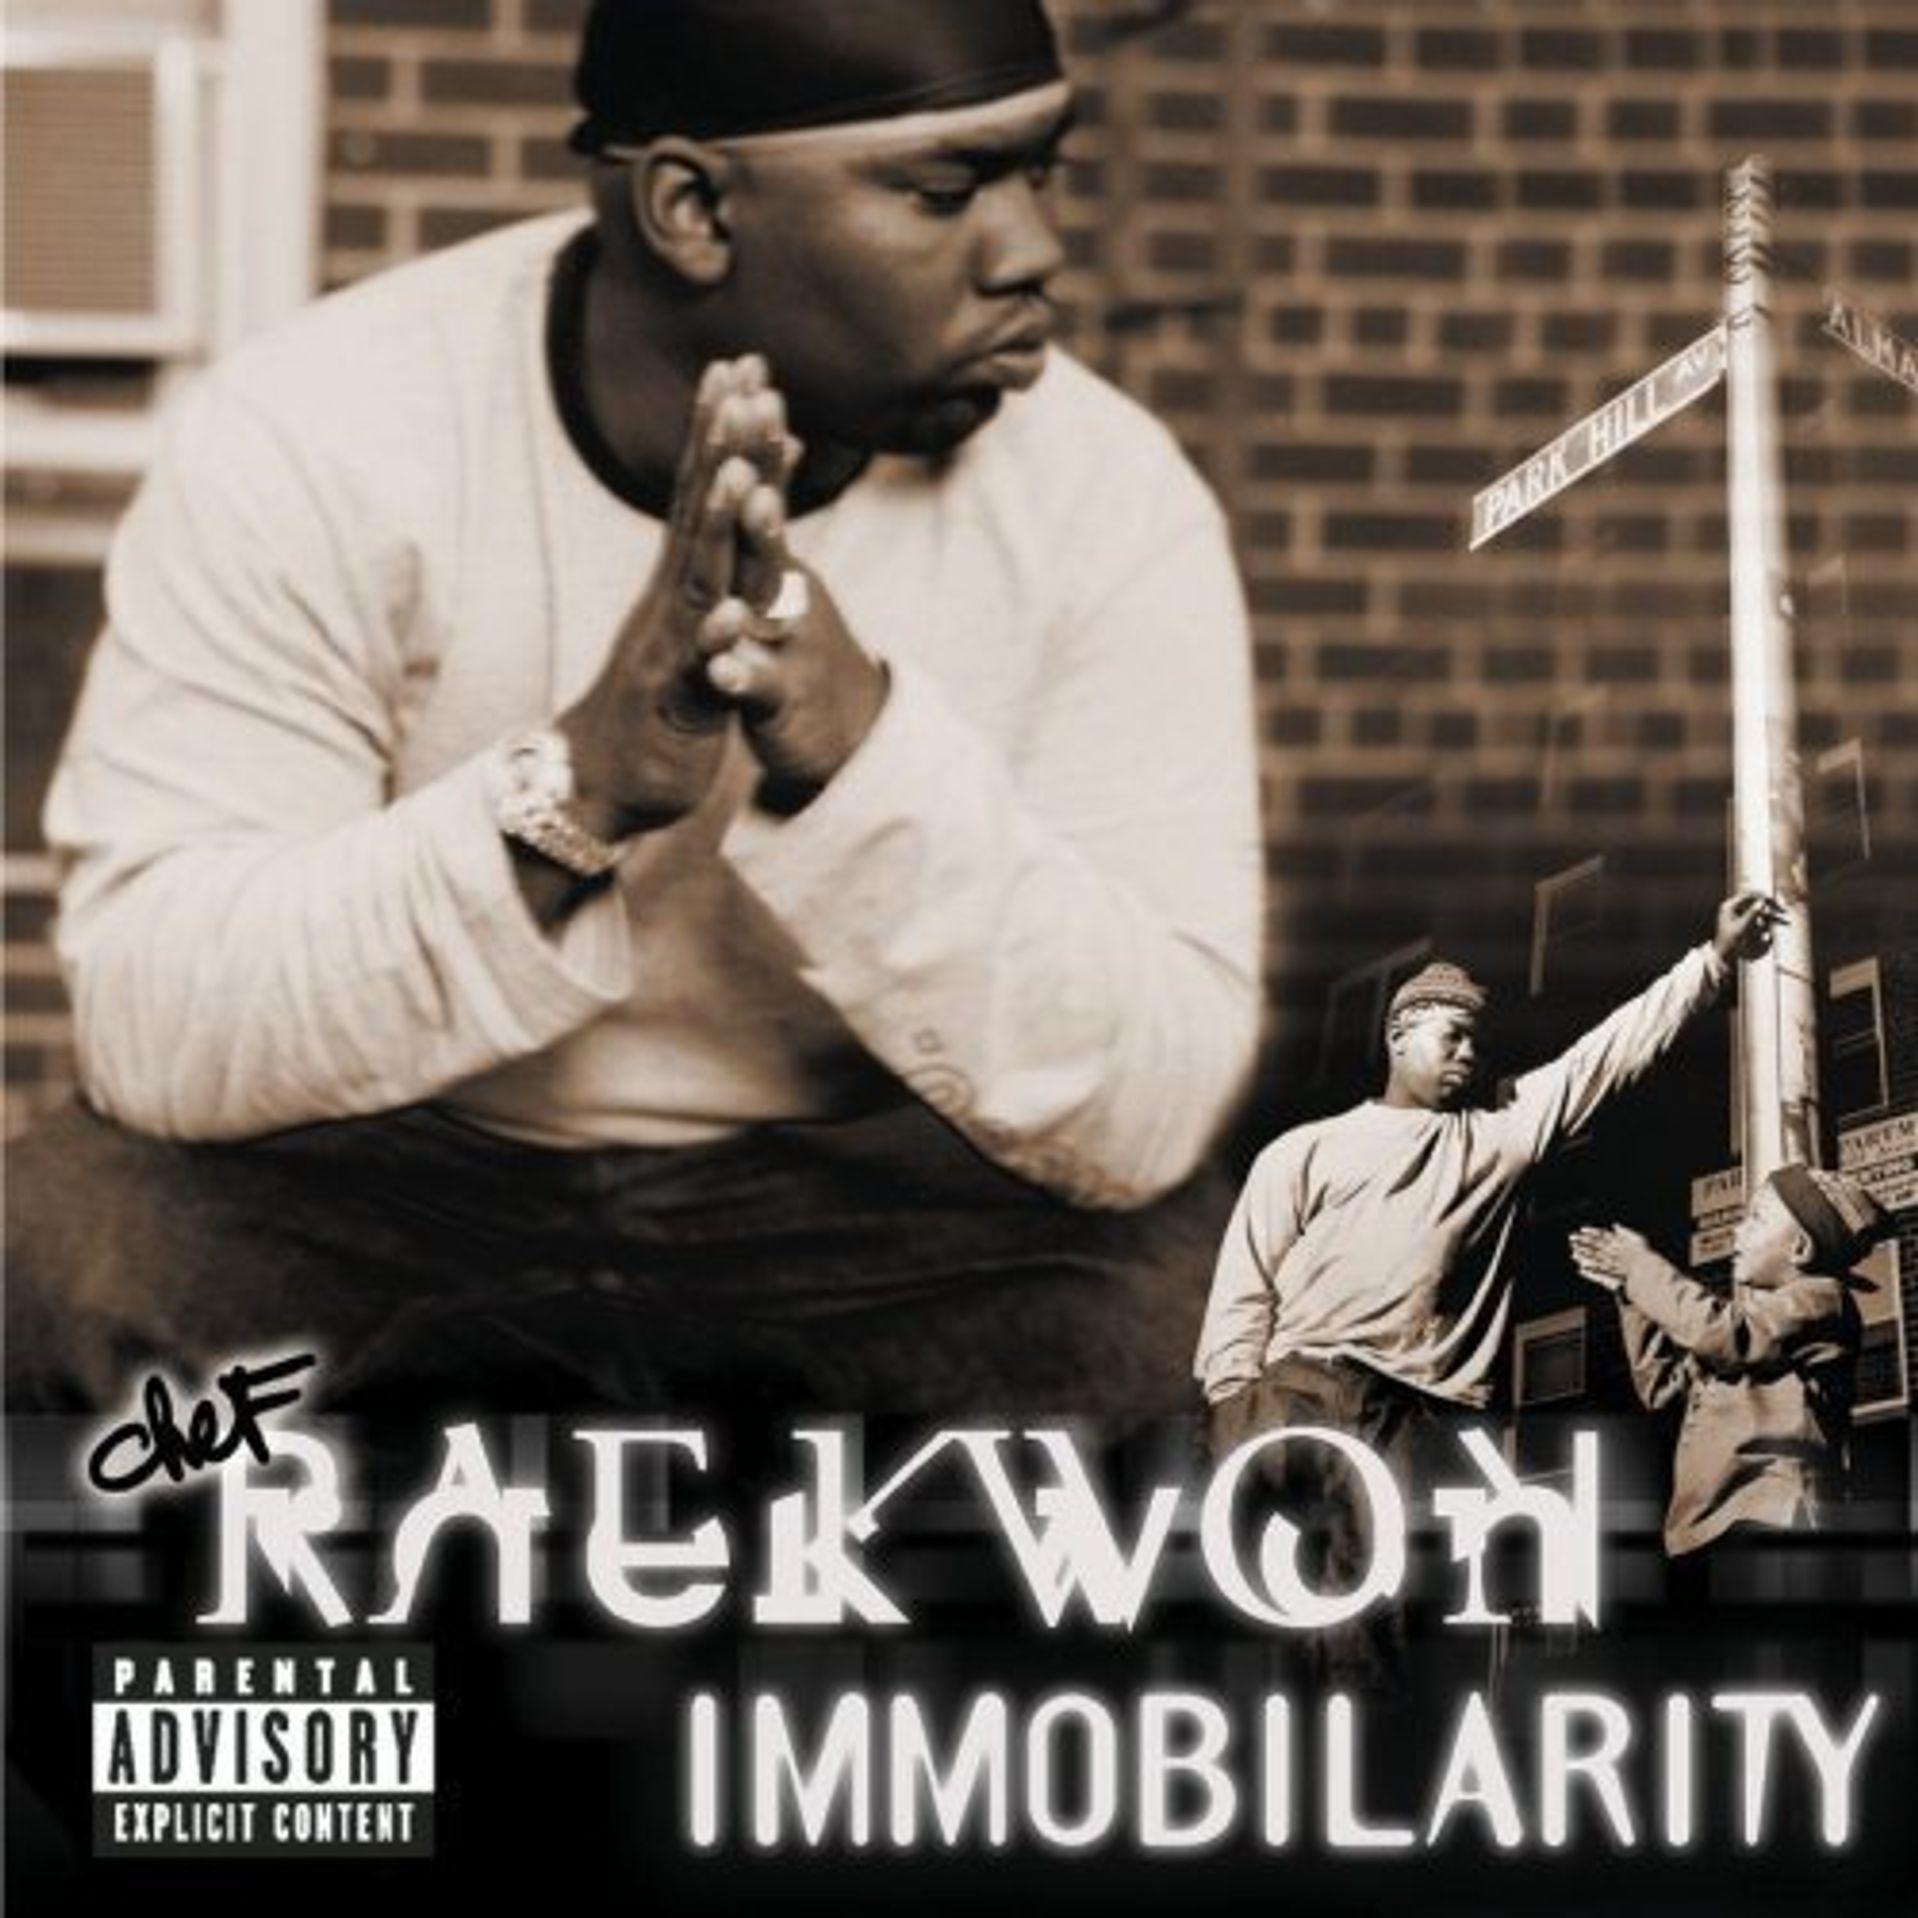 Album Title: Immobilarity by: Raekwon